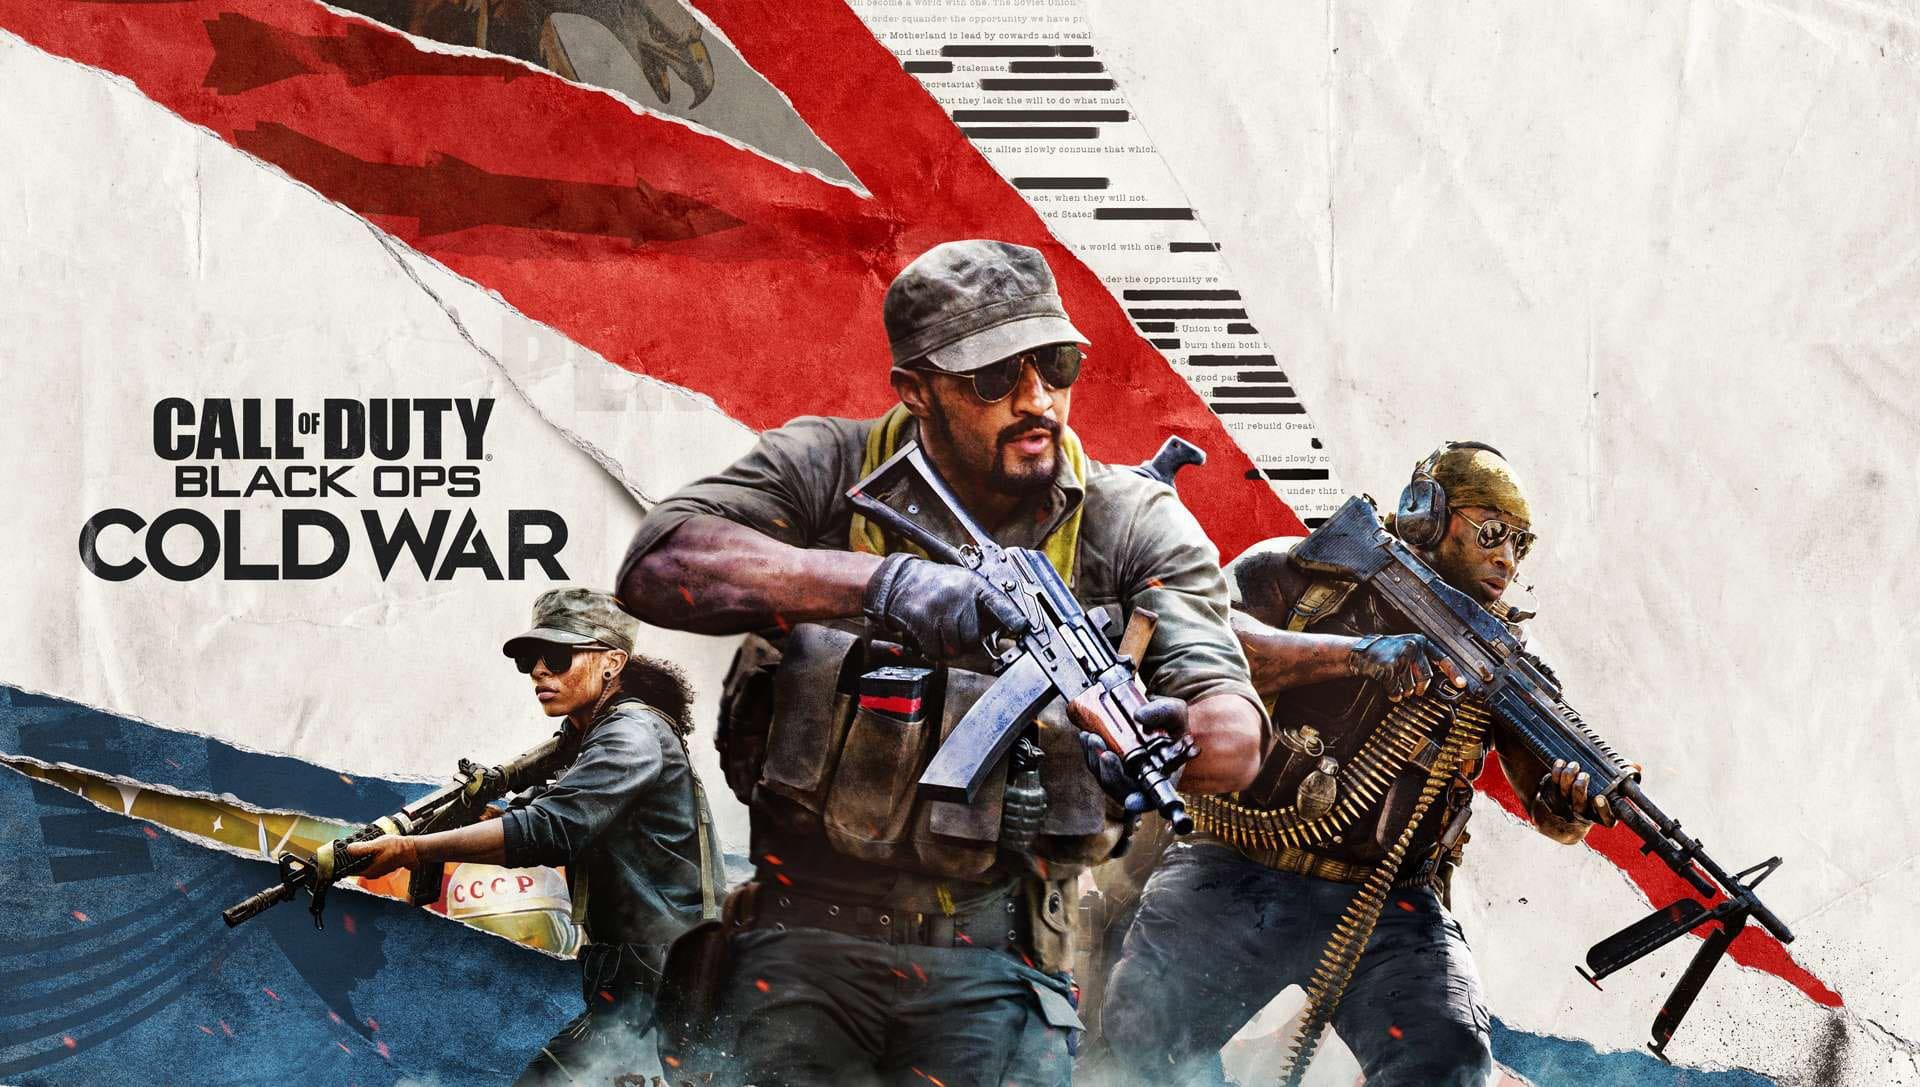 Pacote gratuito de Call of Duty Black Ops Cold War